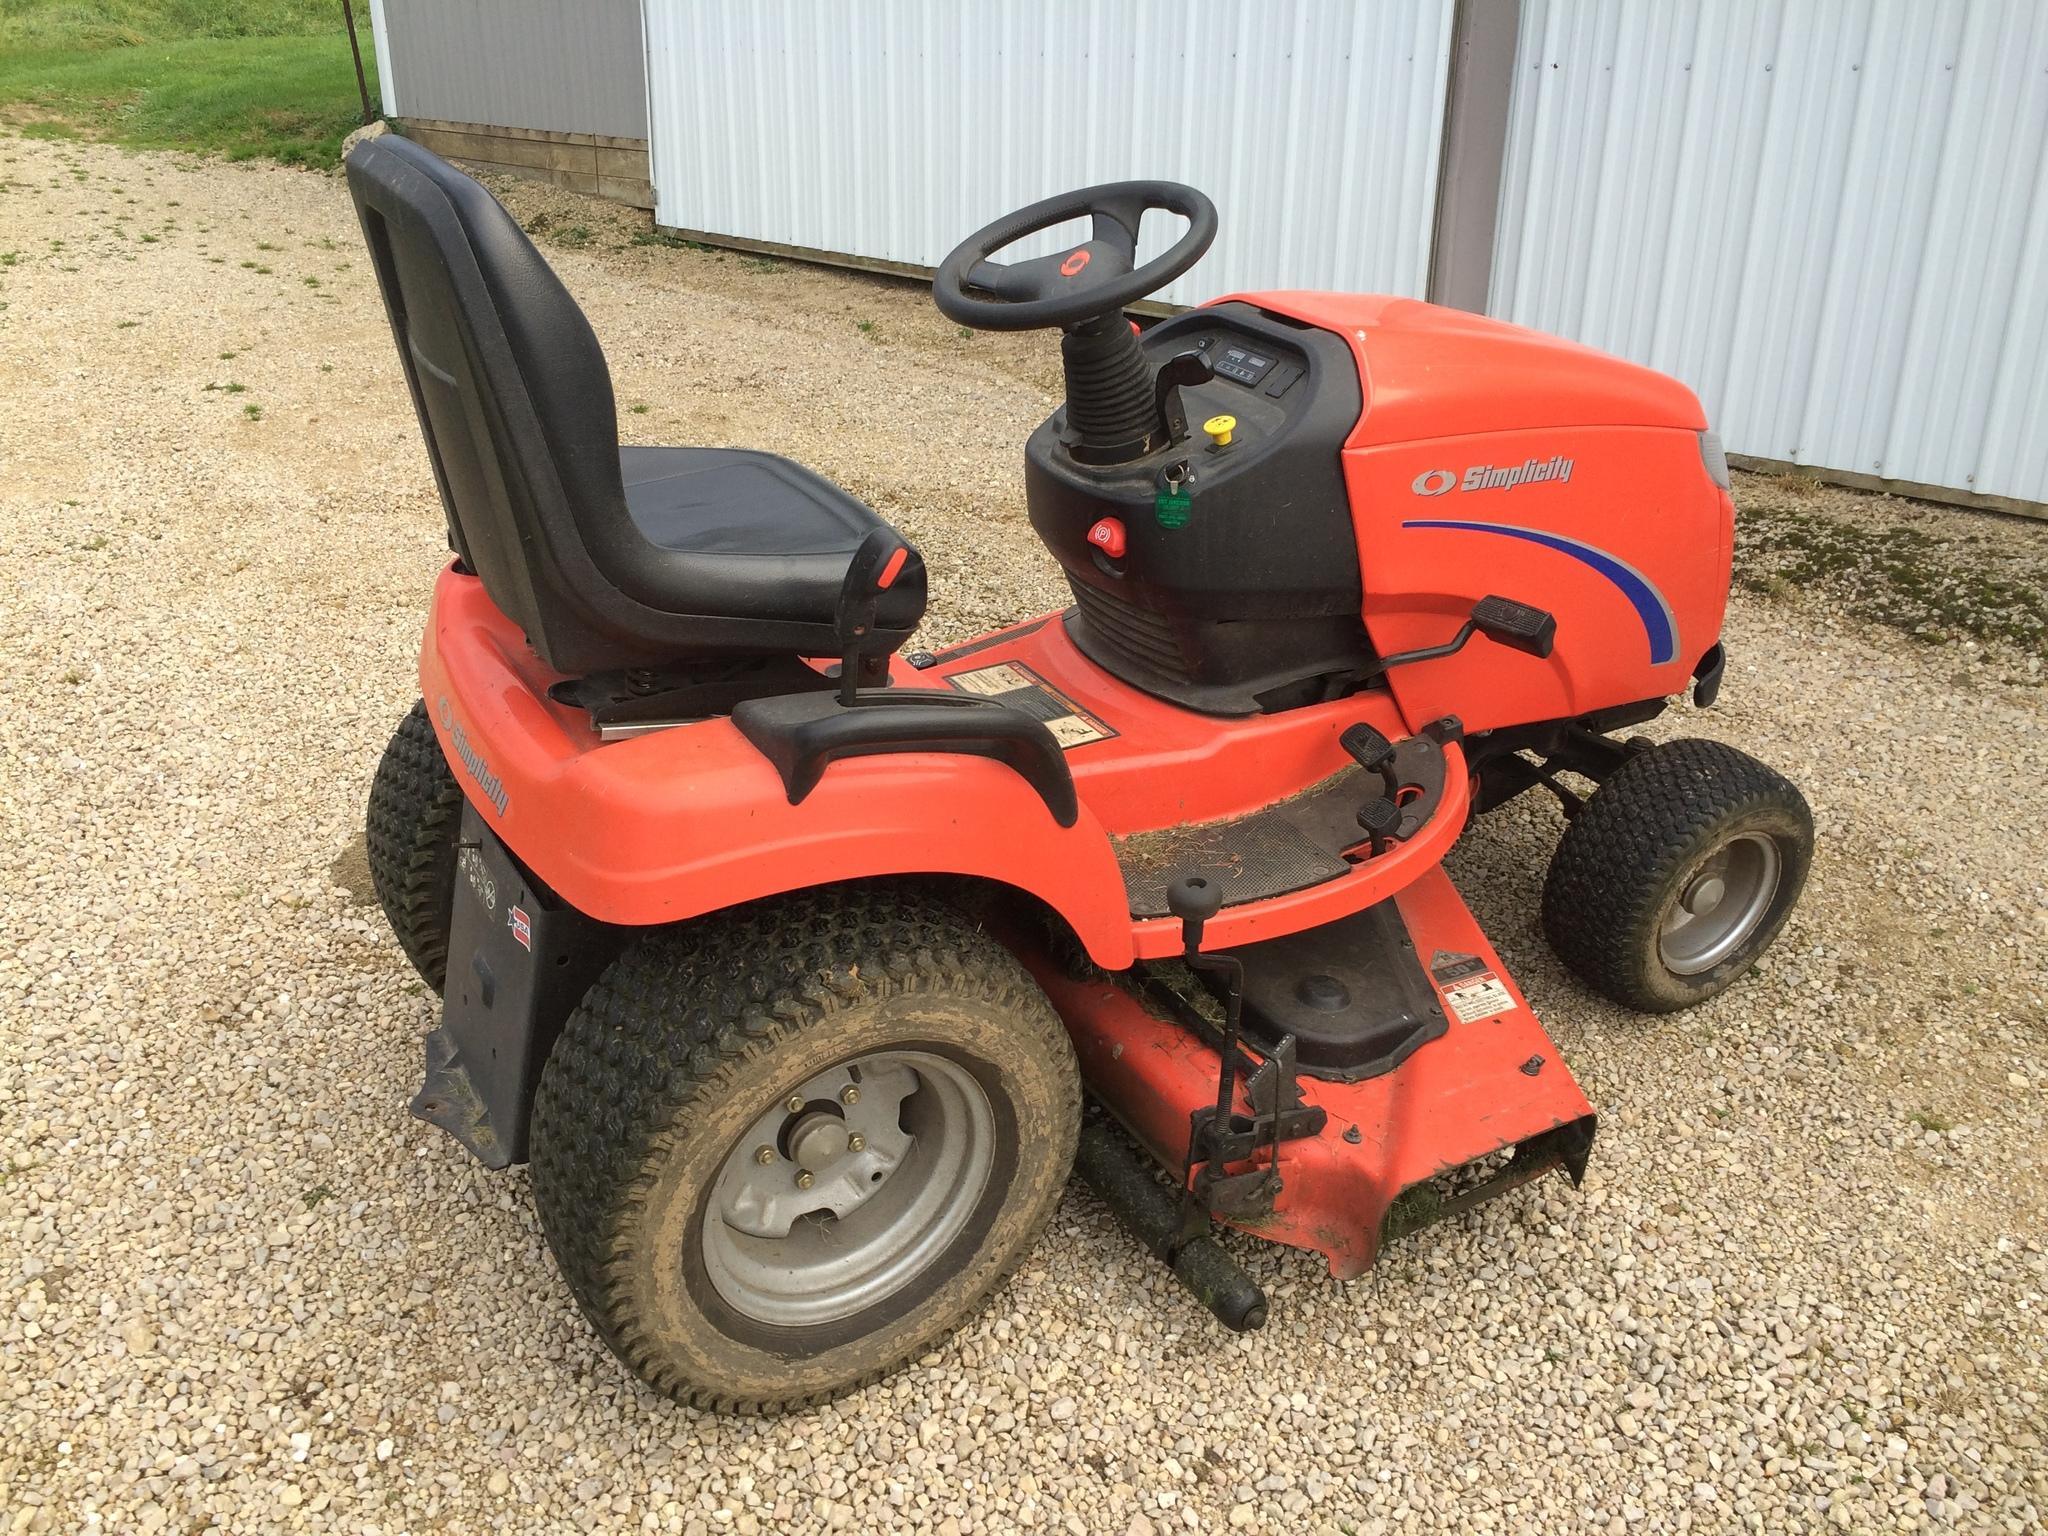 Simplicity prestige lawn garden tractors for sale 66358 for Lawn garden equipment